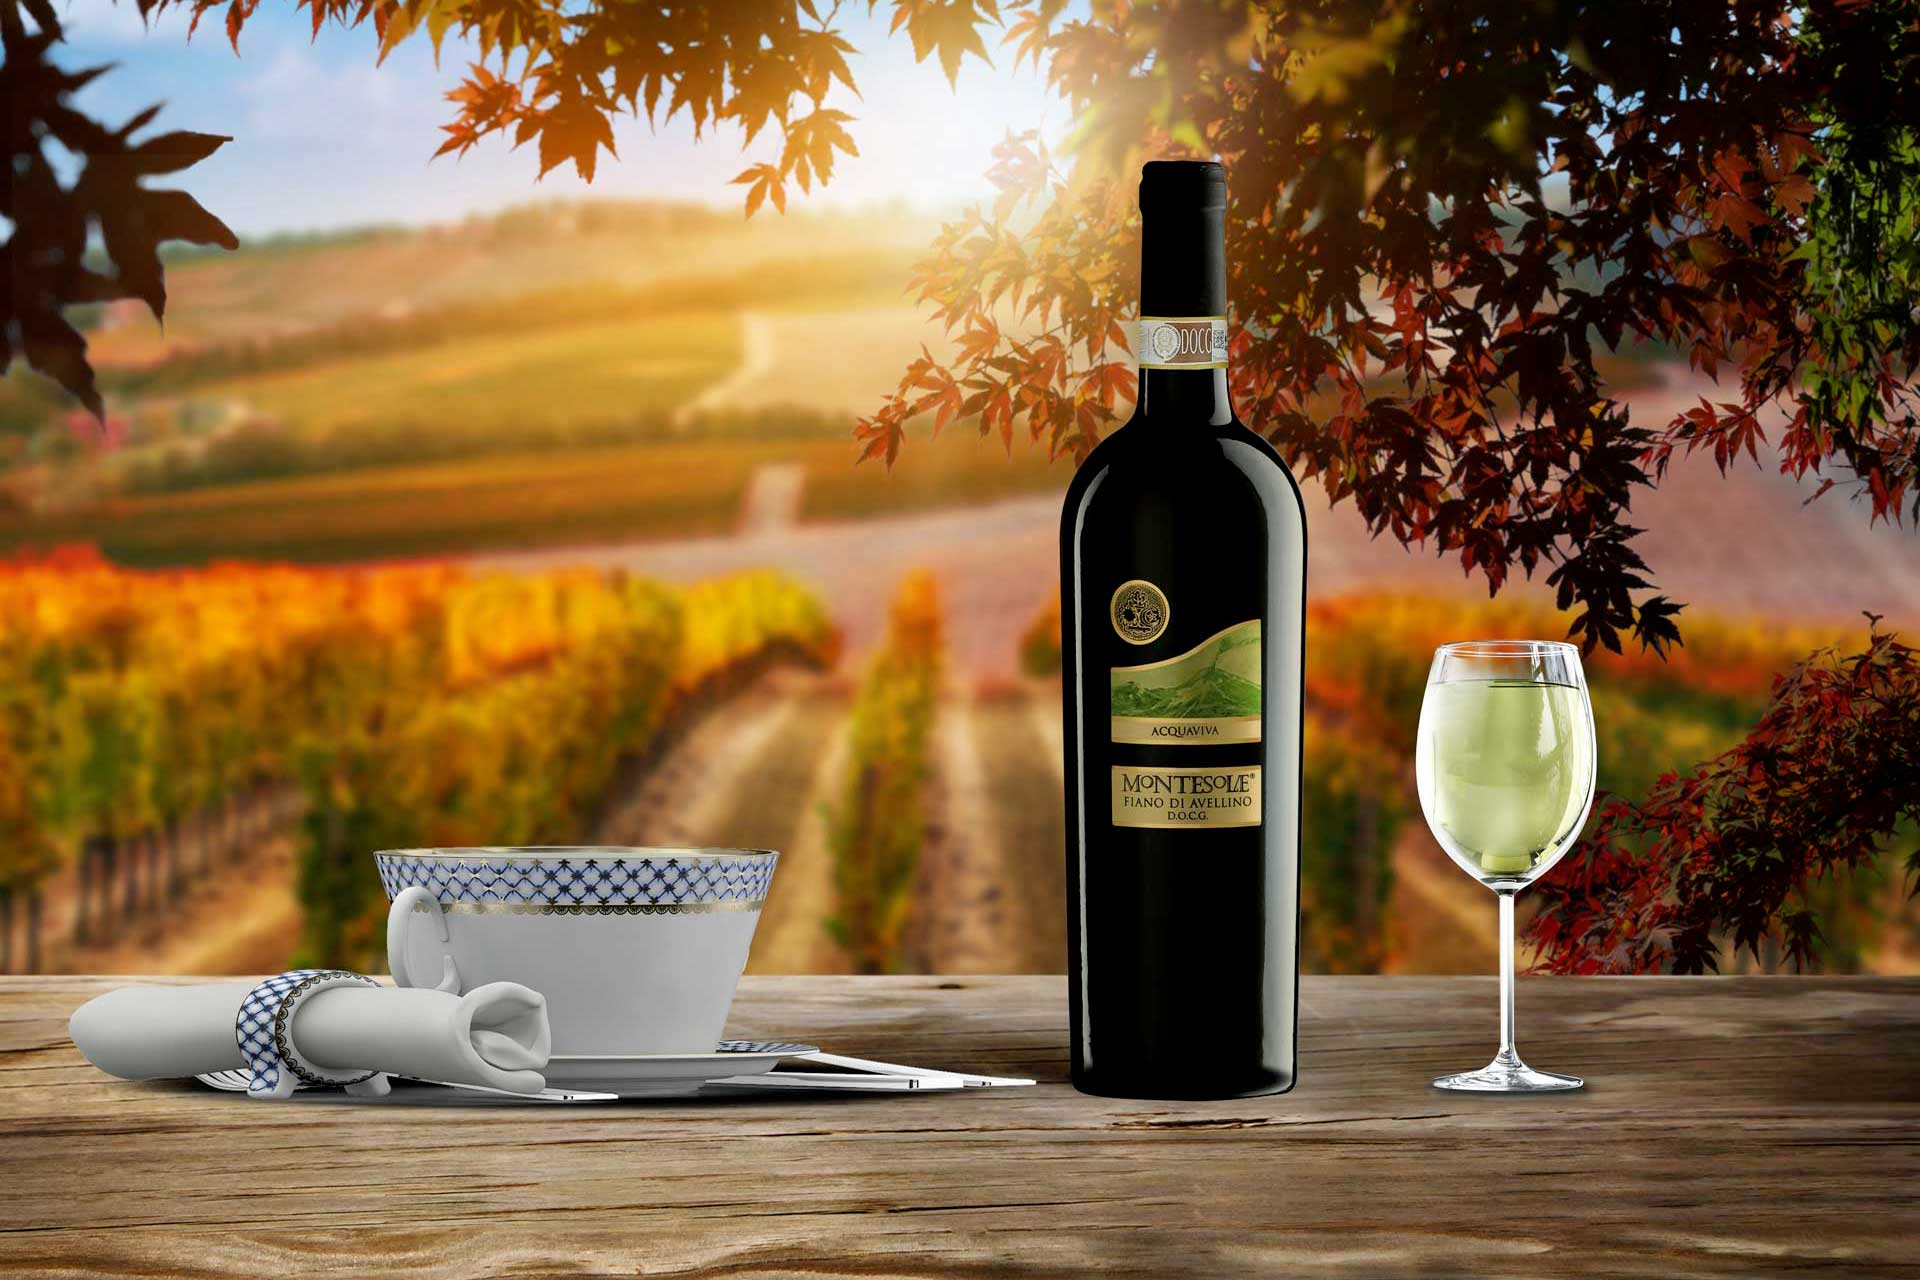 Vigne-Acquaviva-fiano-avellino-docg